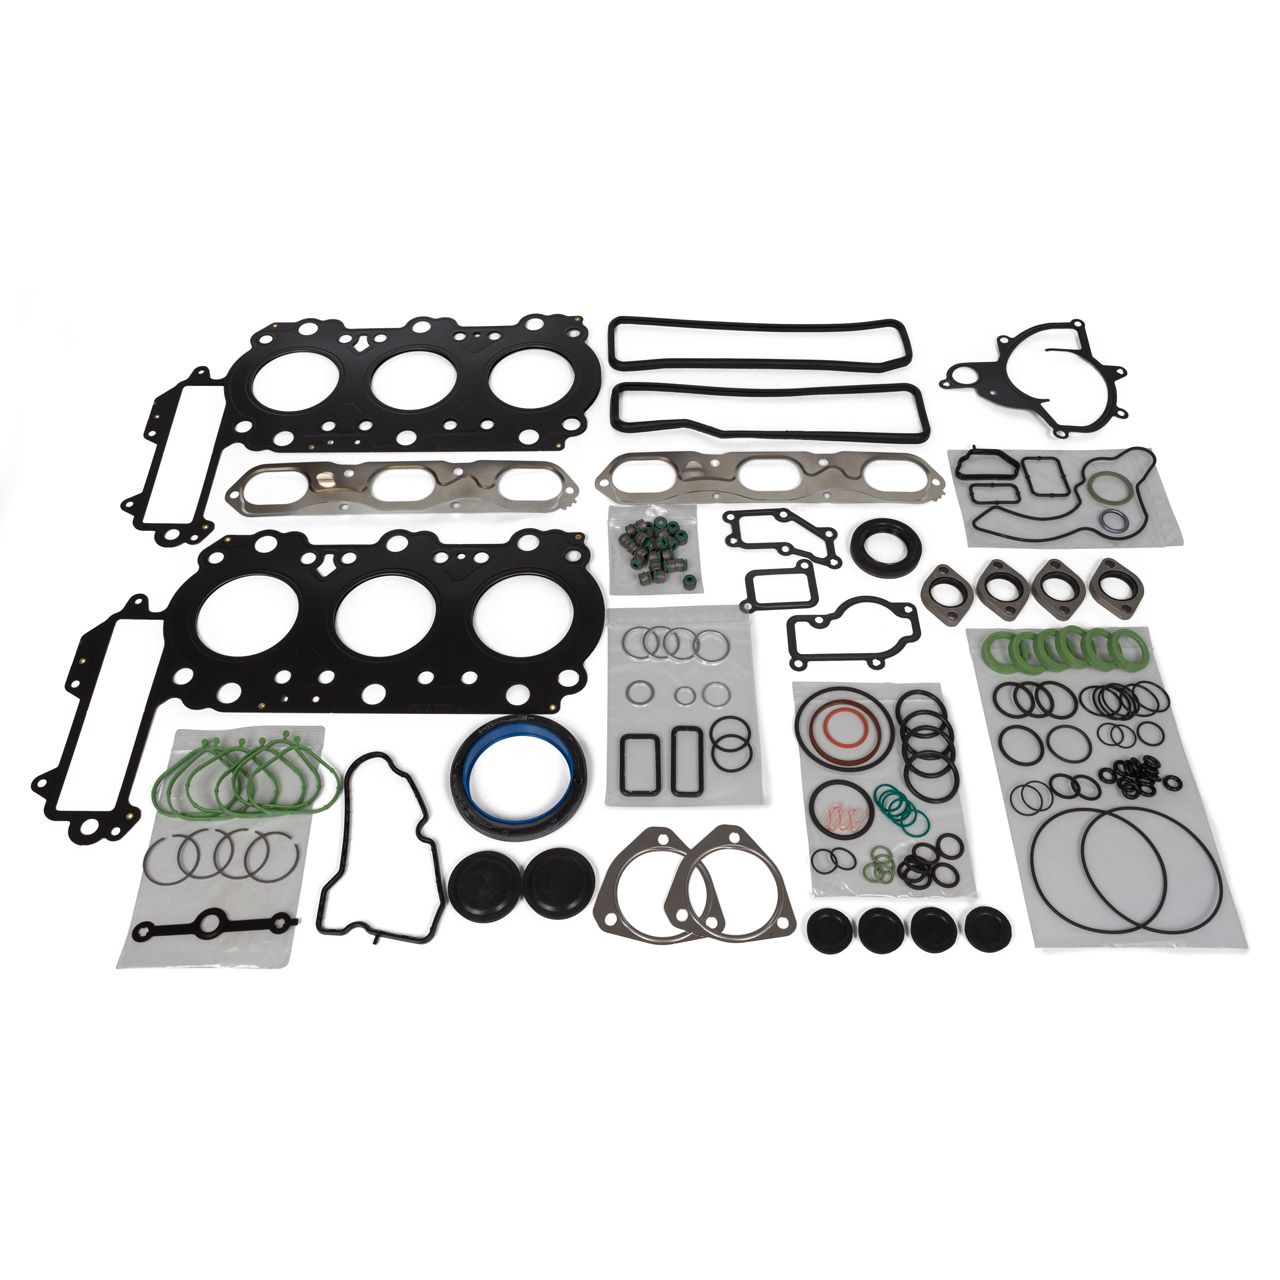 Motordichtungssatz PORSCHE Boxster 987 2.7 220/240 PS M96.25